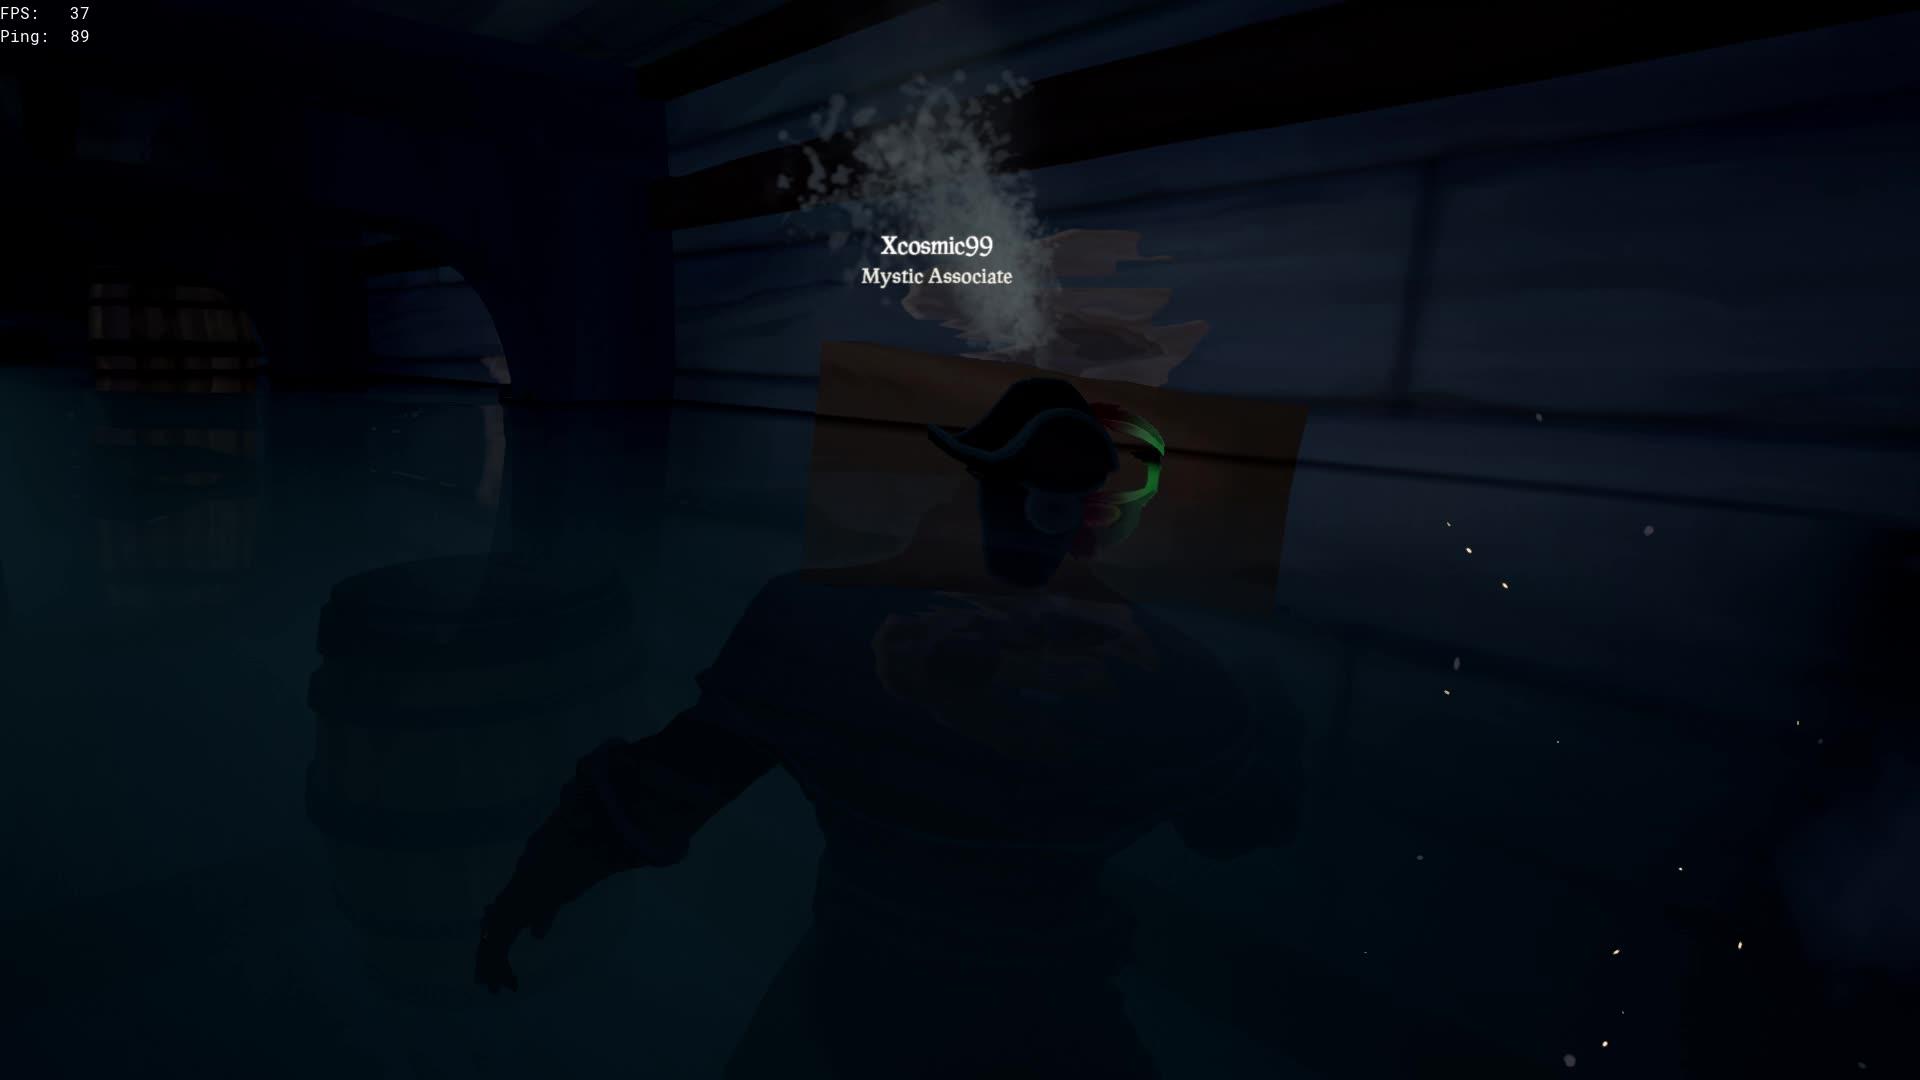 seaofthieves, Sea of Thieves 2018.11.30 - 15.52.41.02.DVR GIFs